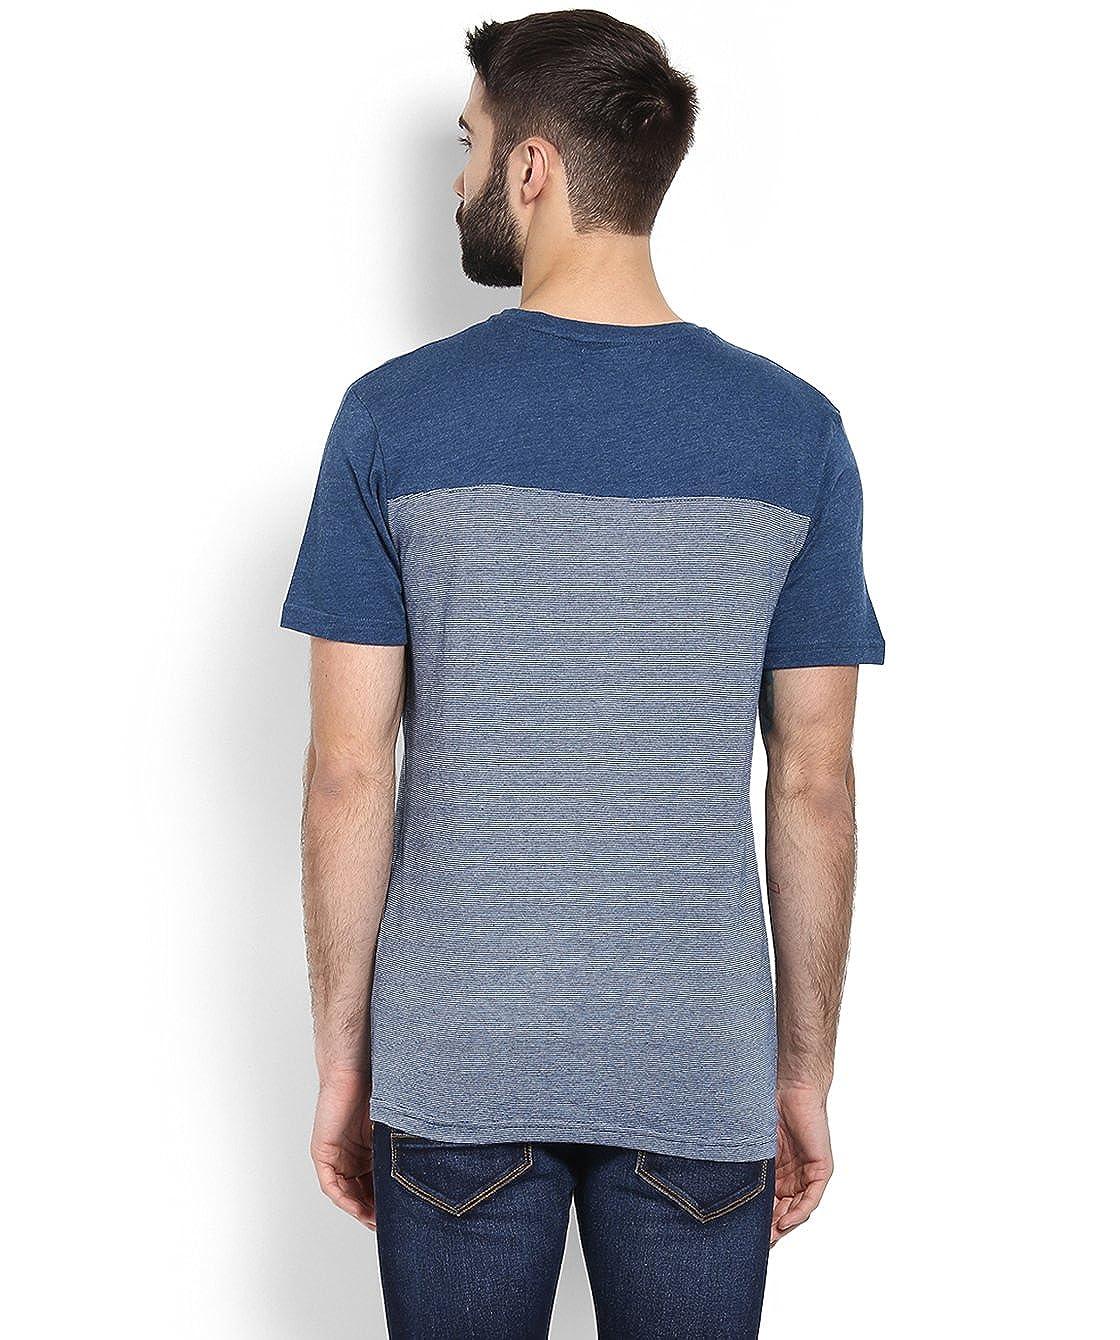 Celio GEBLEU Camiseta, Azul (Navy Navy), M para Hombre: Amazon.es ...